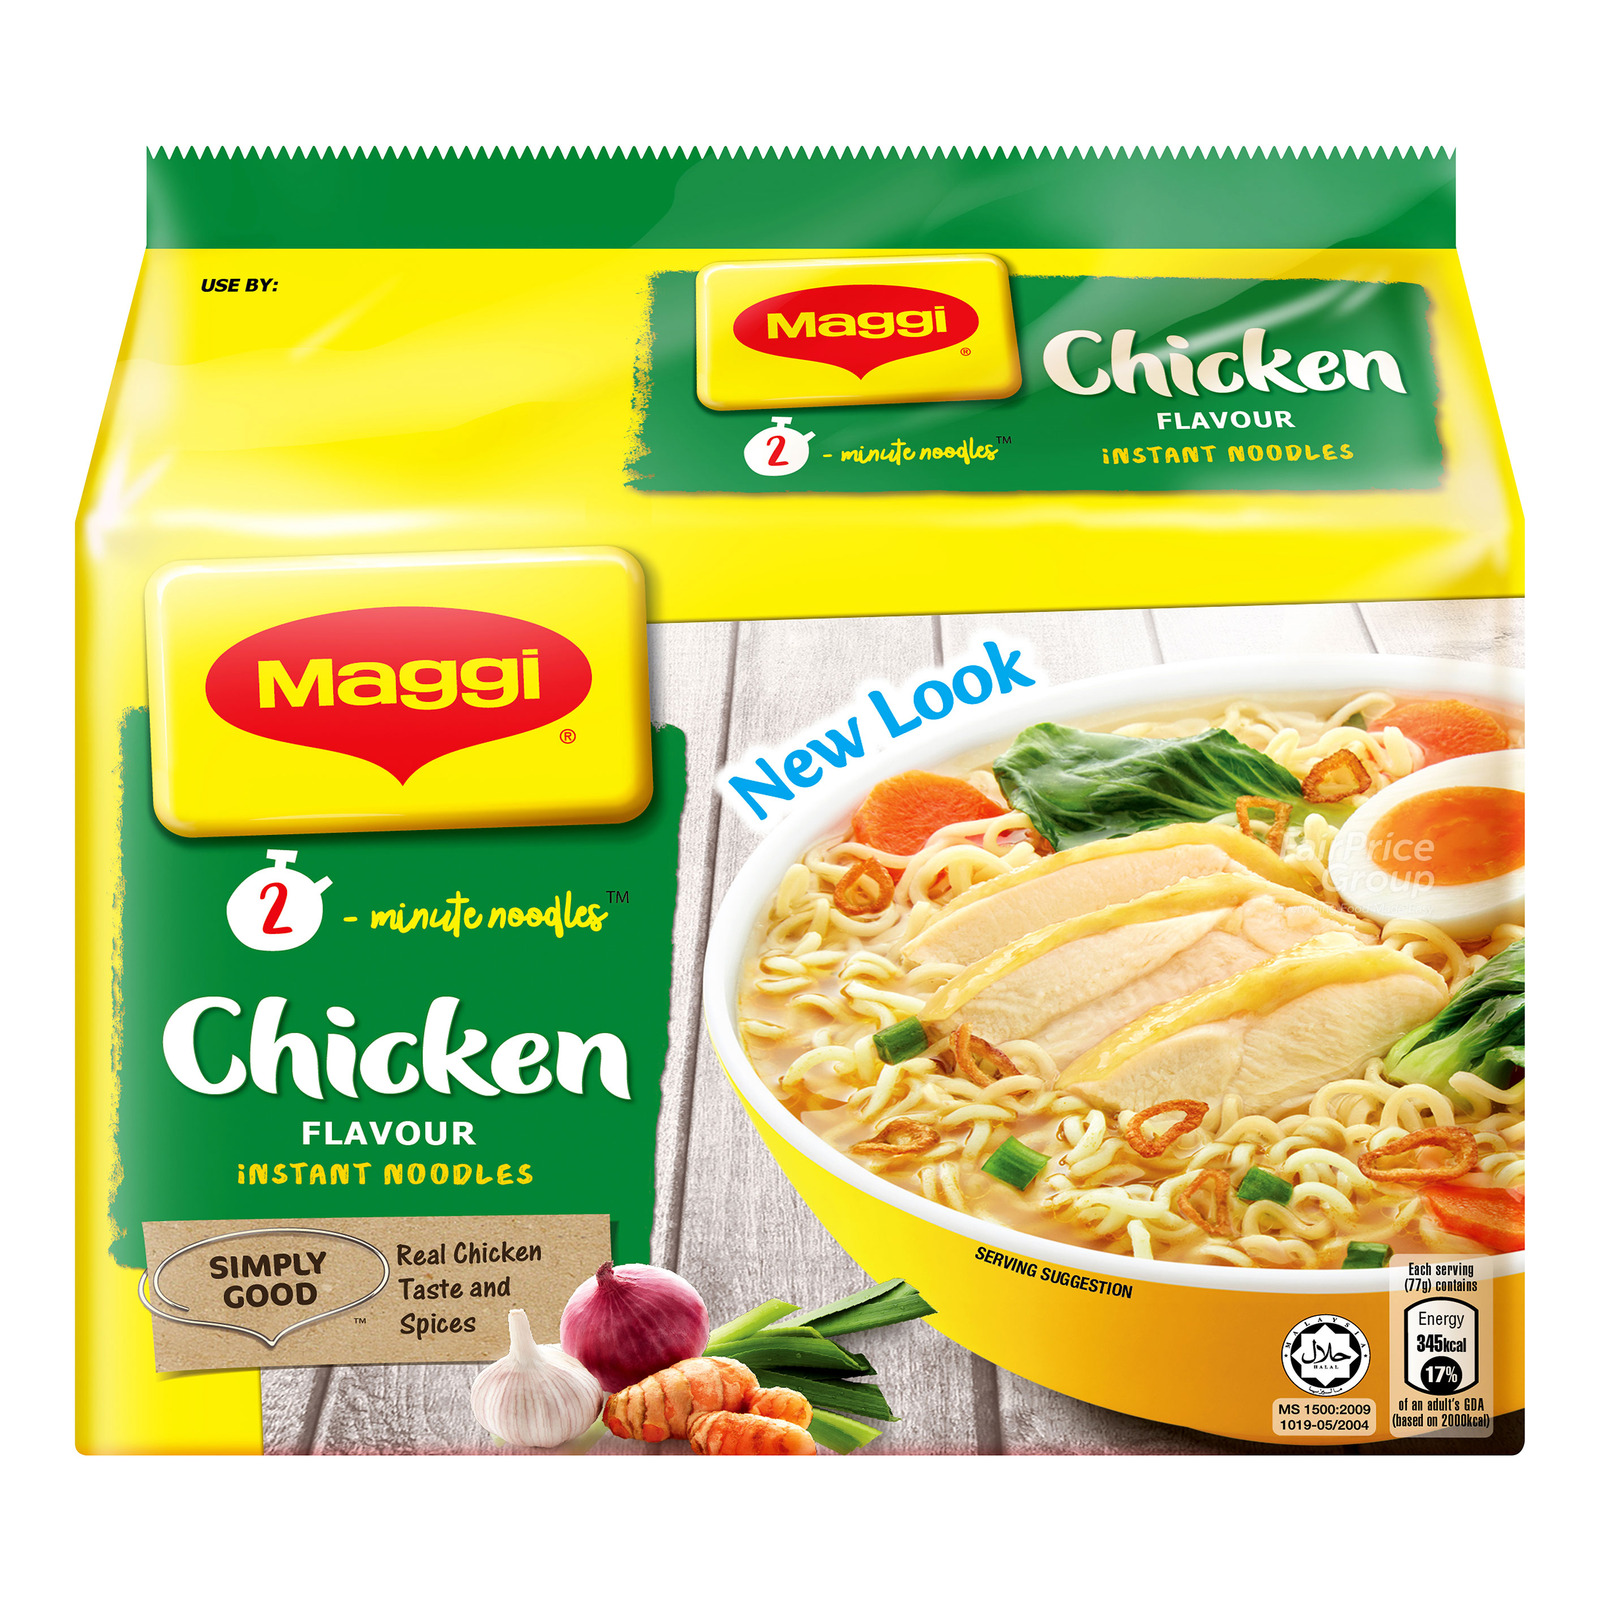 Maggi 2-Minute Instant Noodles - Chicken